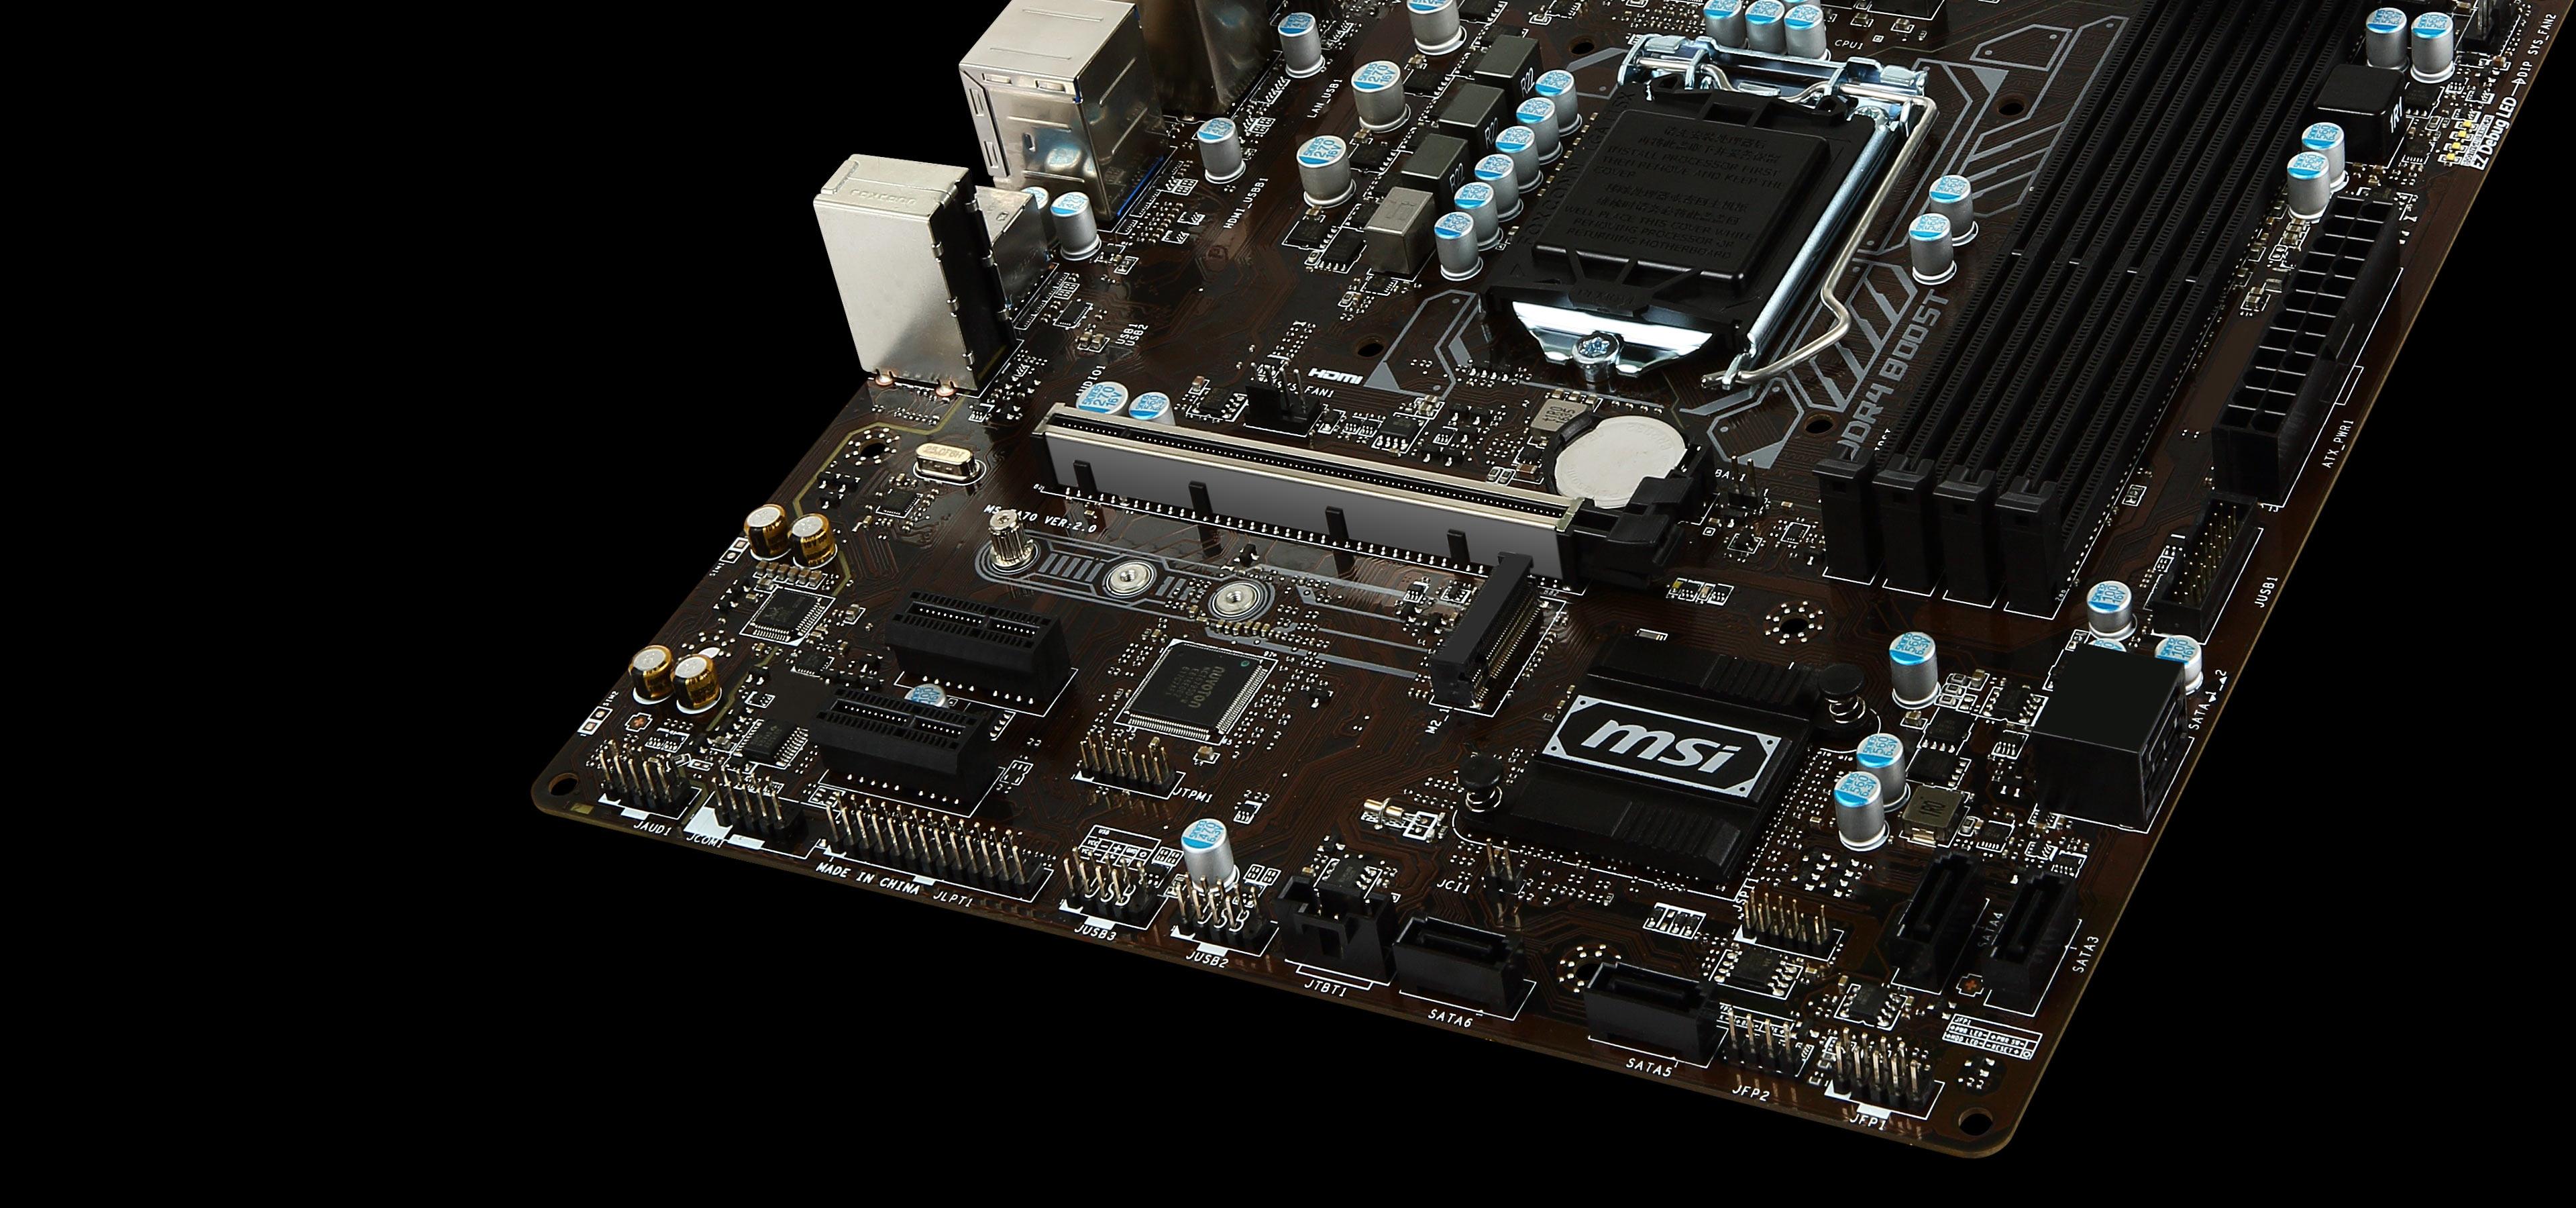 MSI B250M PRO-VDH Pro Series LGA 1151 DDR4 HDMI USB 3.1